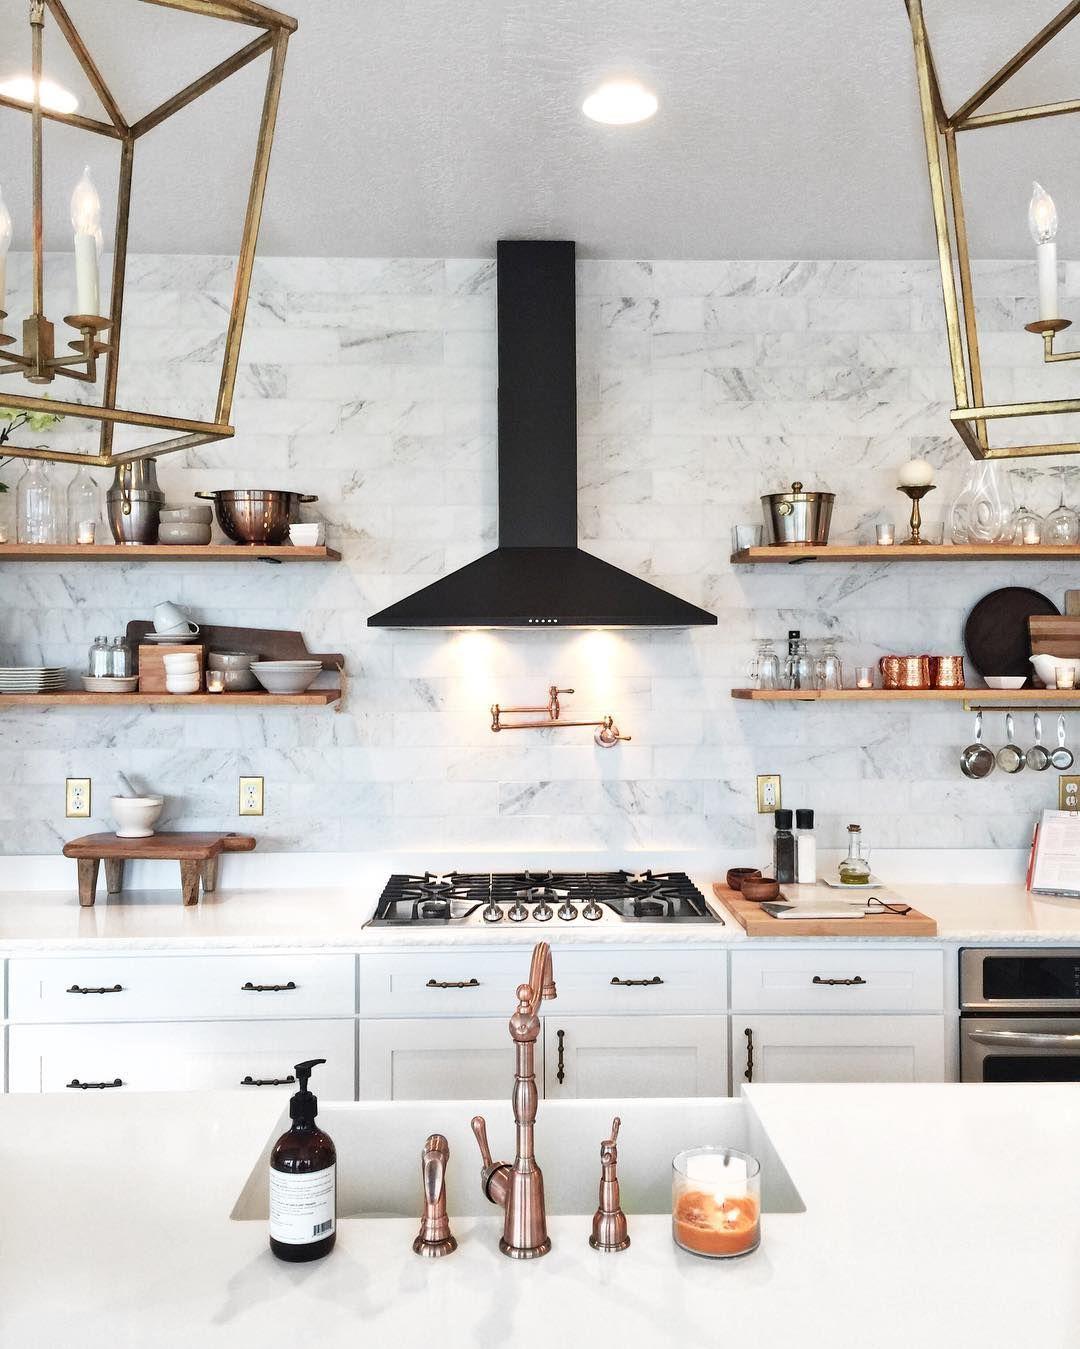 Kitchen Art The Range: Viking Wall Mount Ducted Hood $1929 Vs Home Depot Akdy